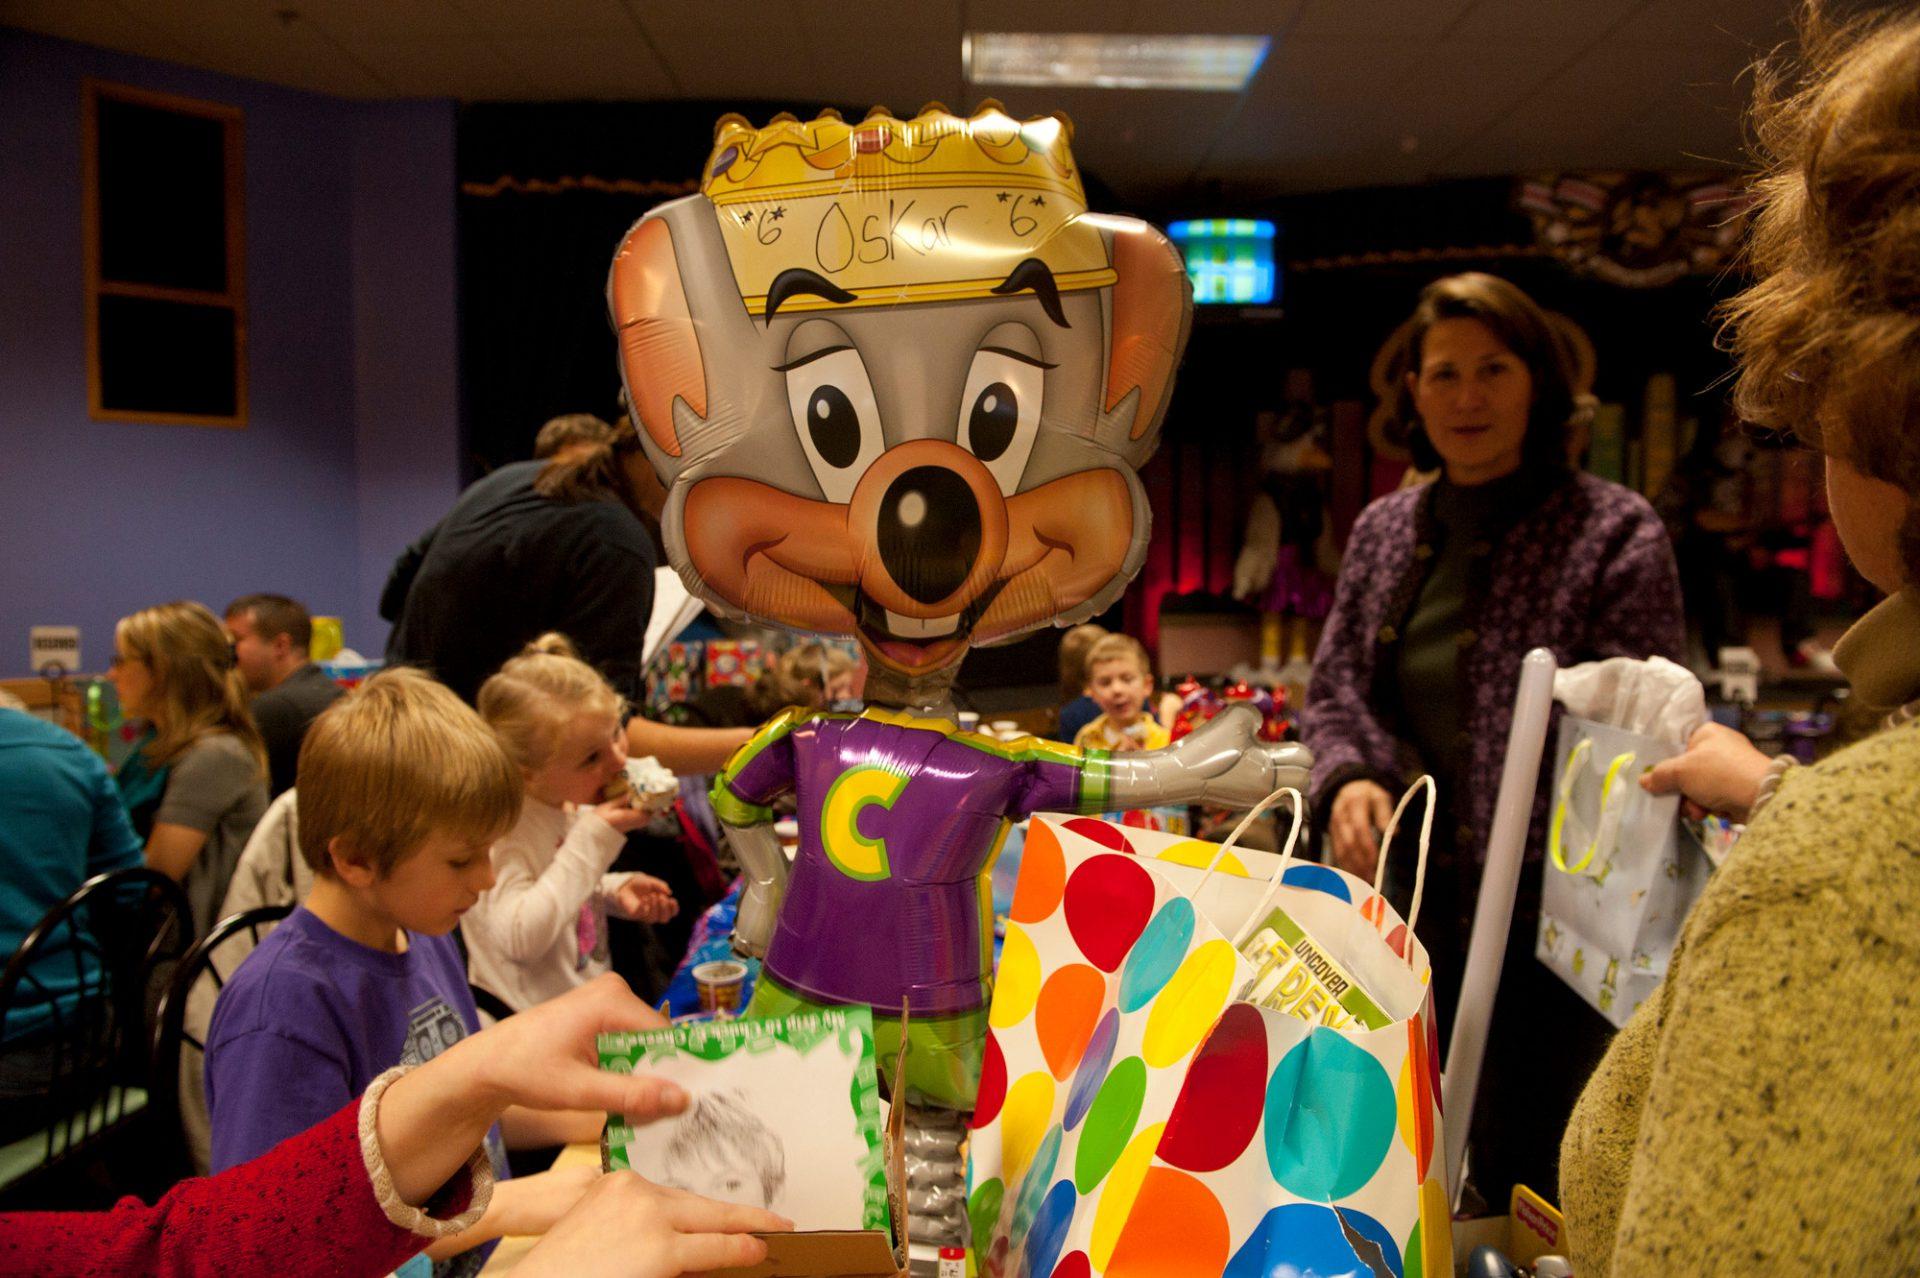 Photo: A birthday party at Chuck E. Cheese's in Lincoln, Nebraska.